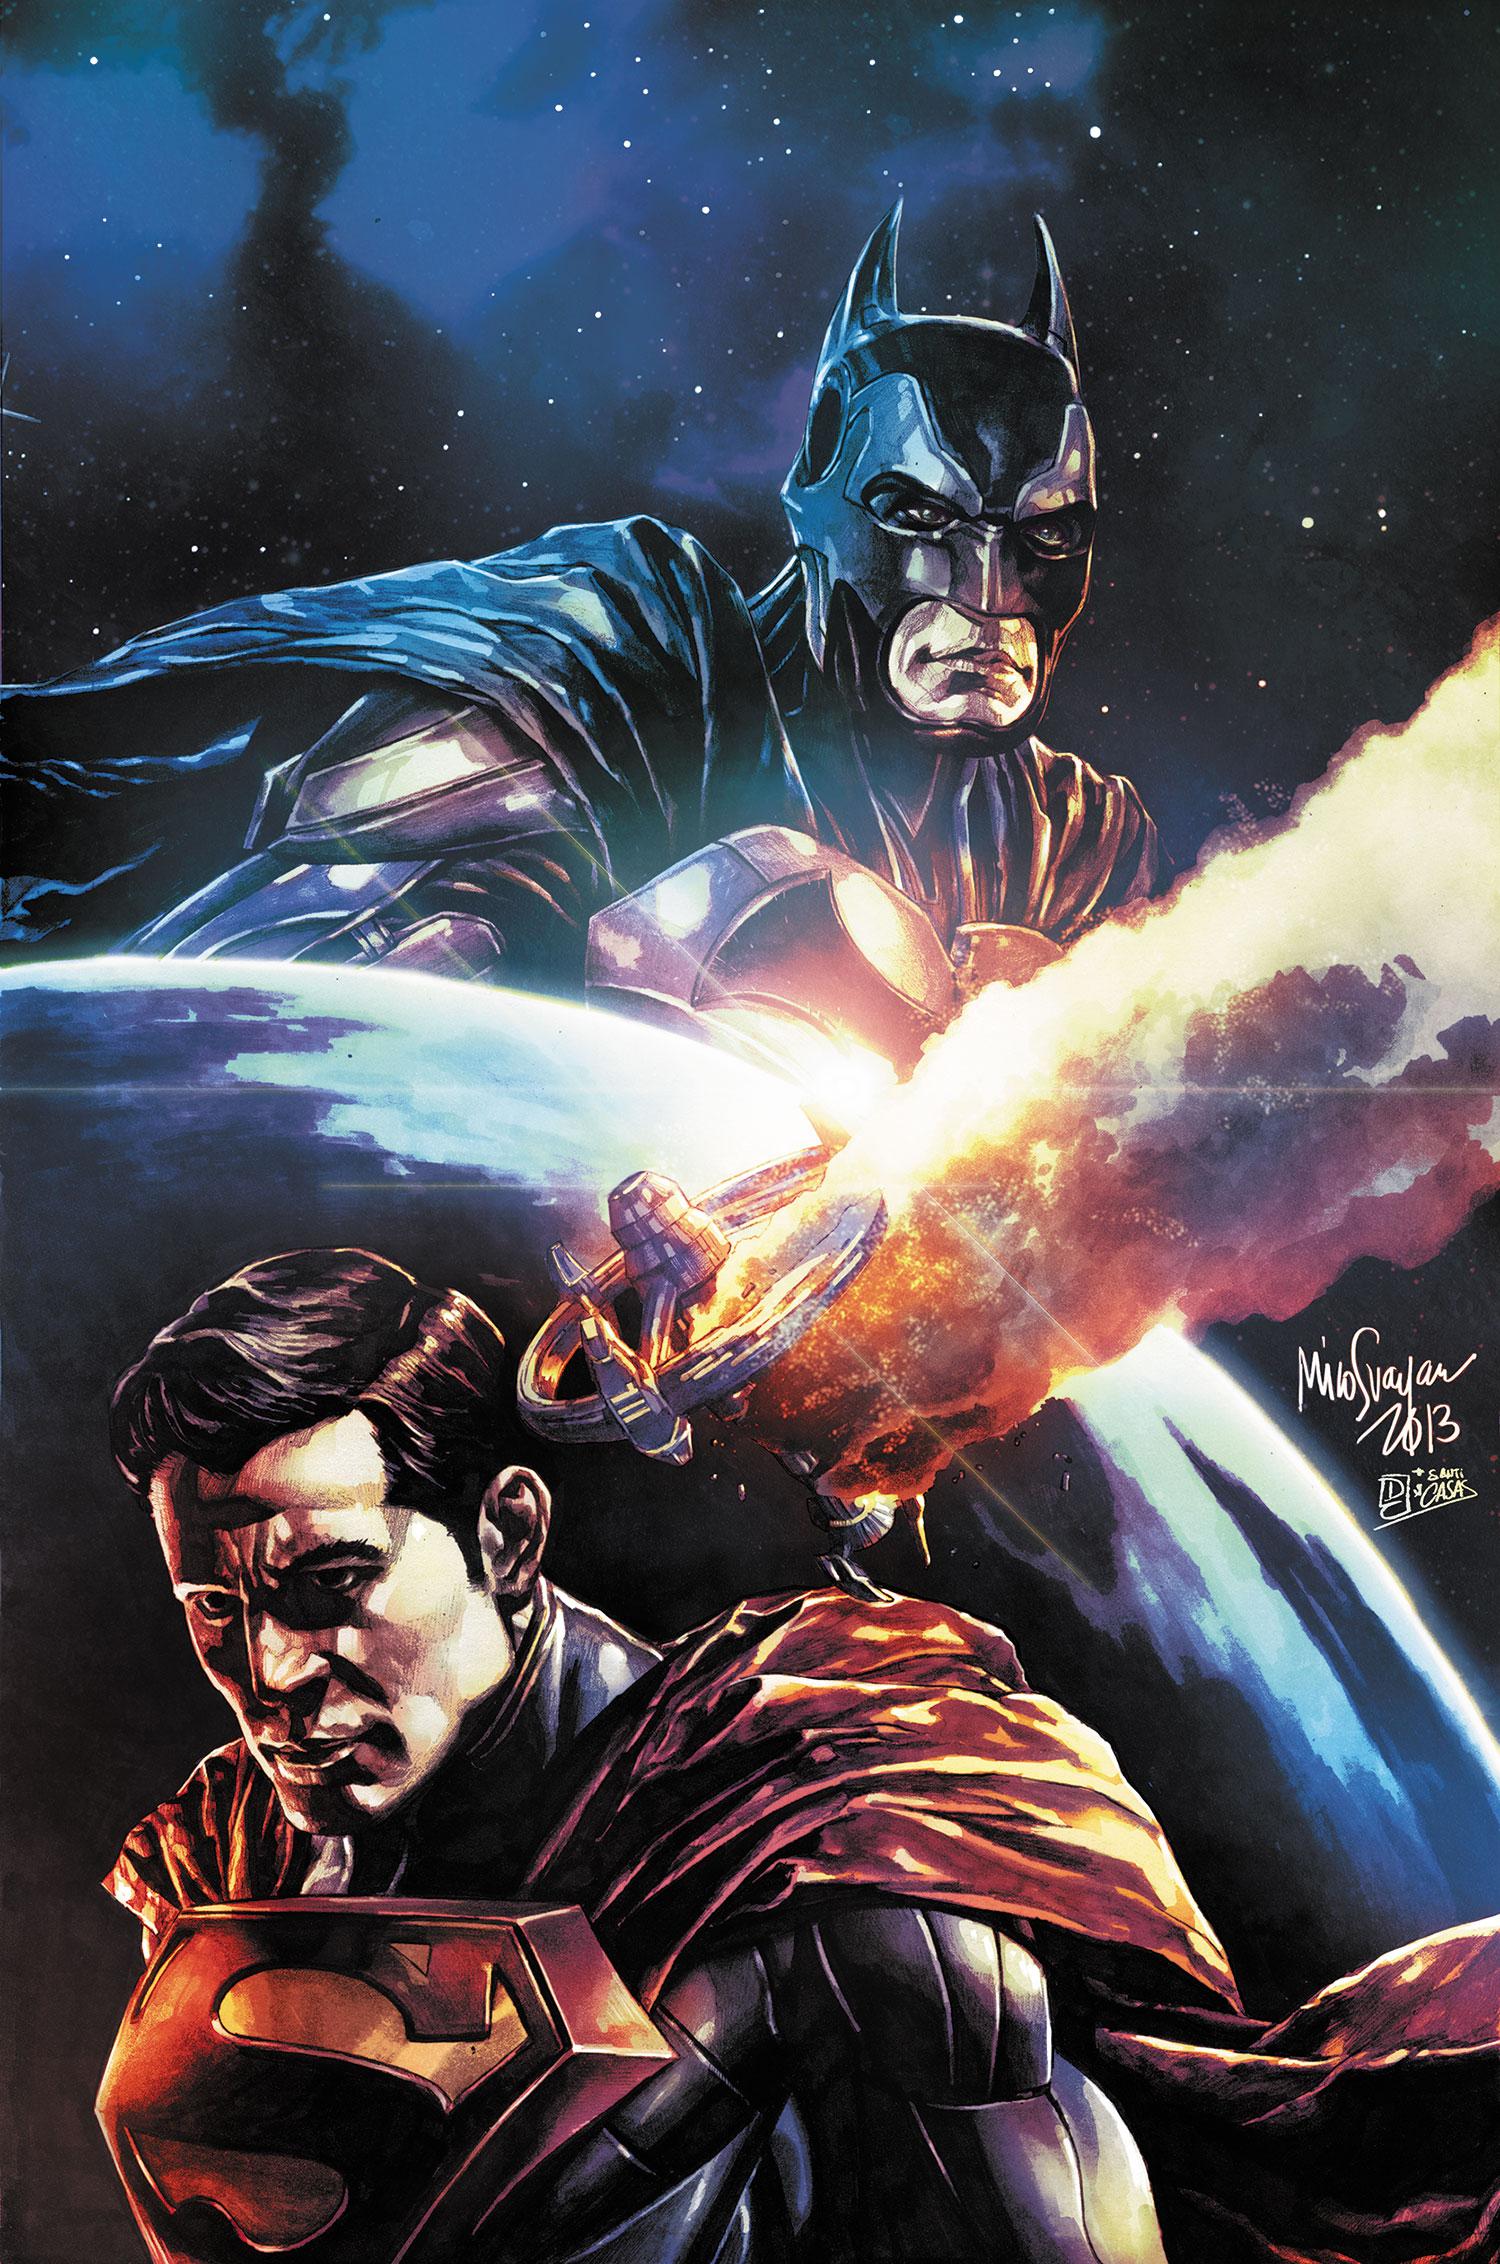 Injustice Gods Among Us 3 1st Print Wonder Woman Superman Batman Raapack cover